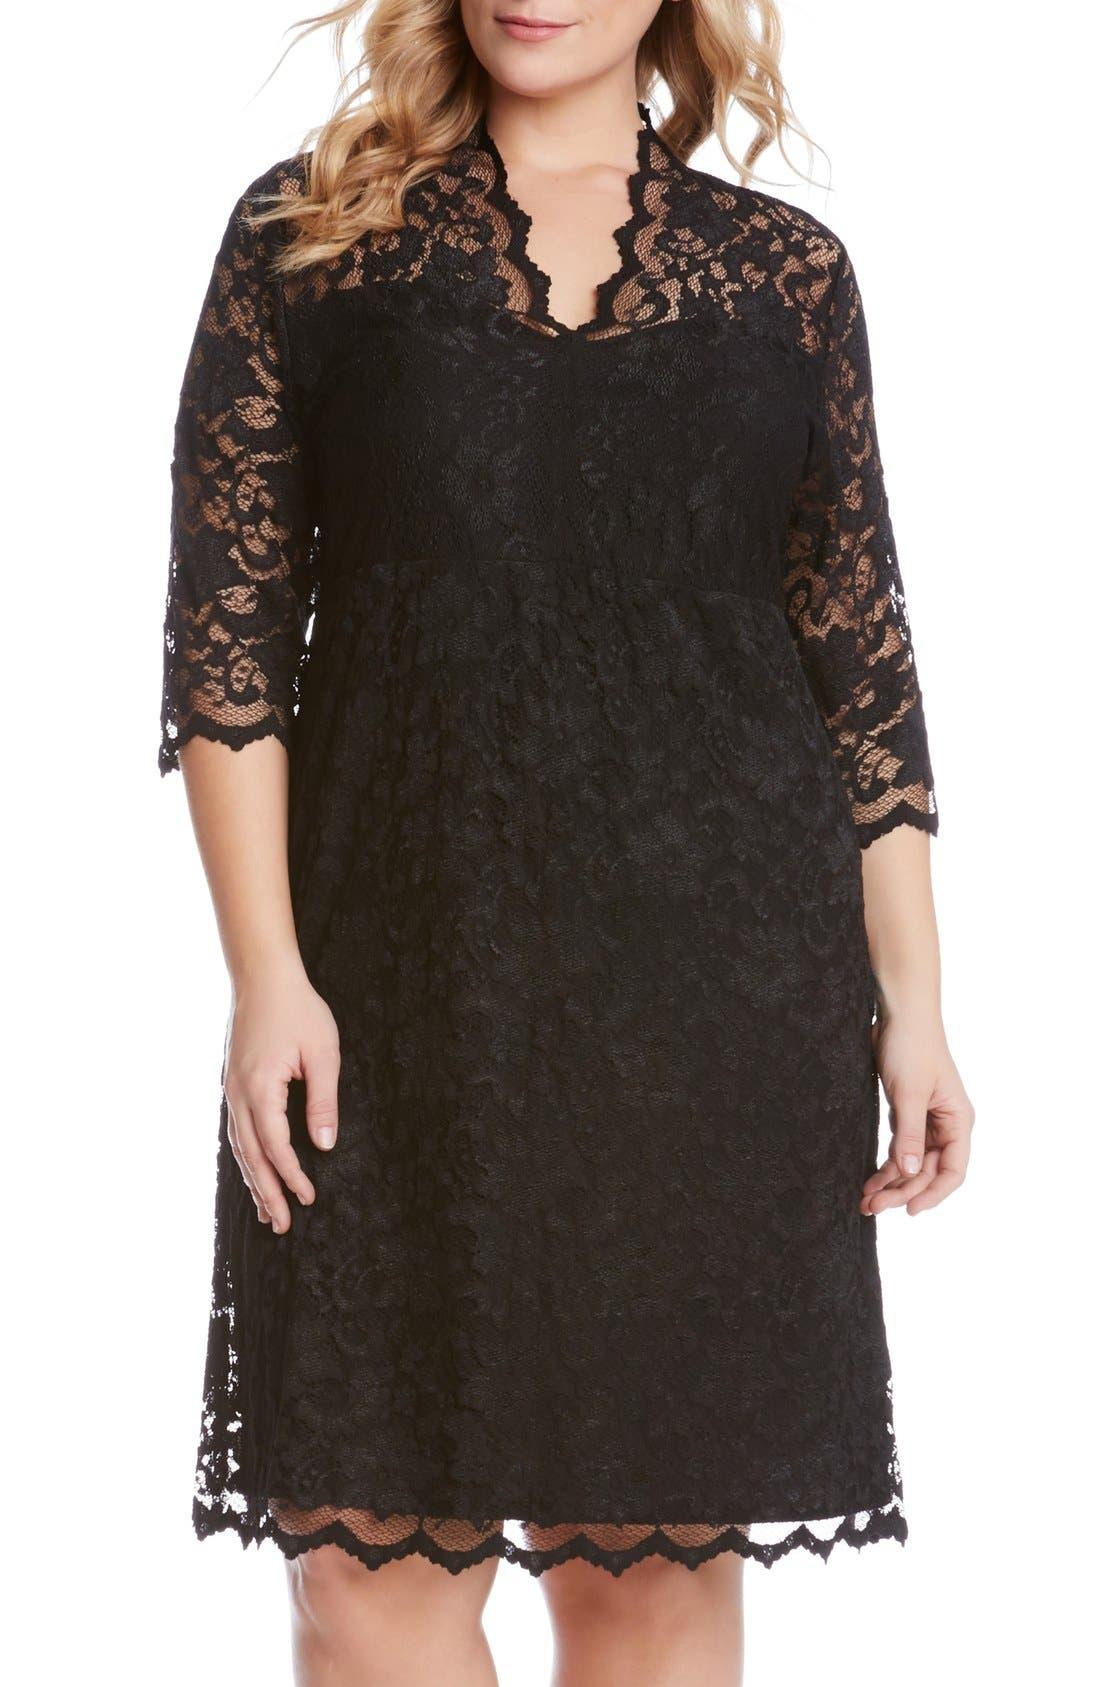 KAREN KANE, Scalloped Stretch Lace Dress, Main thumbnail 1, color, BLACK